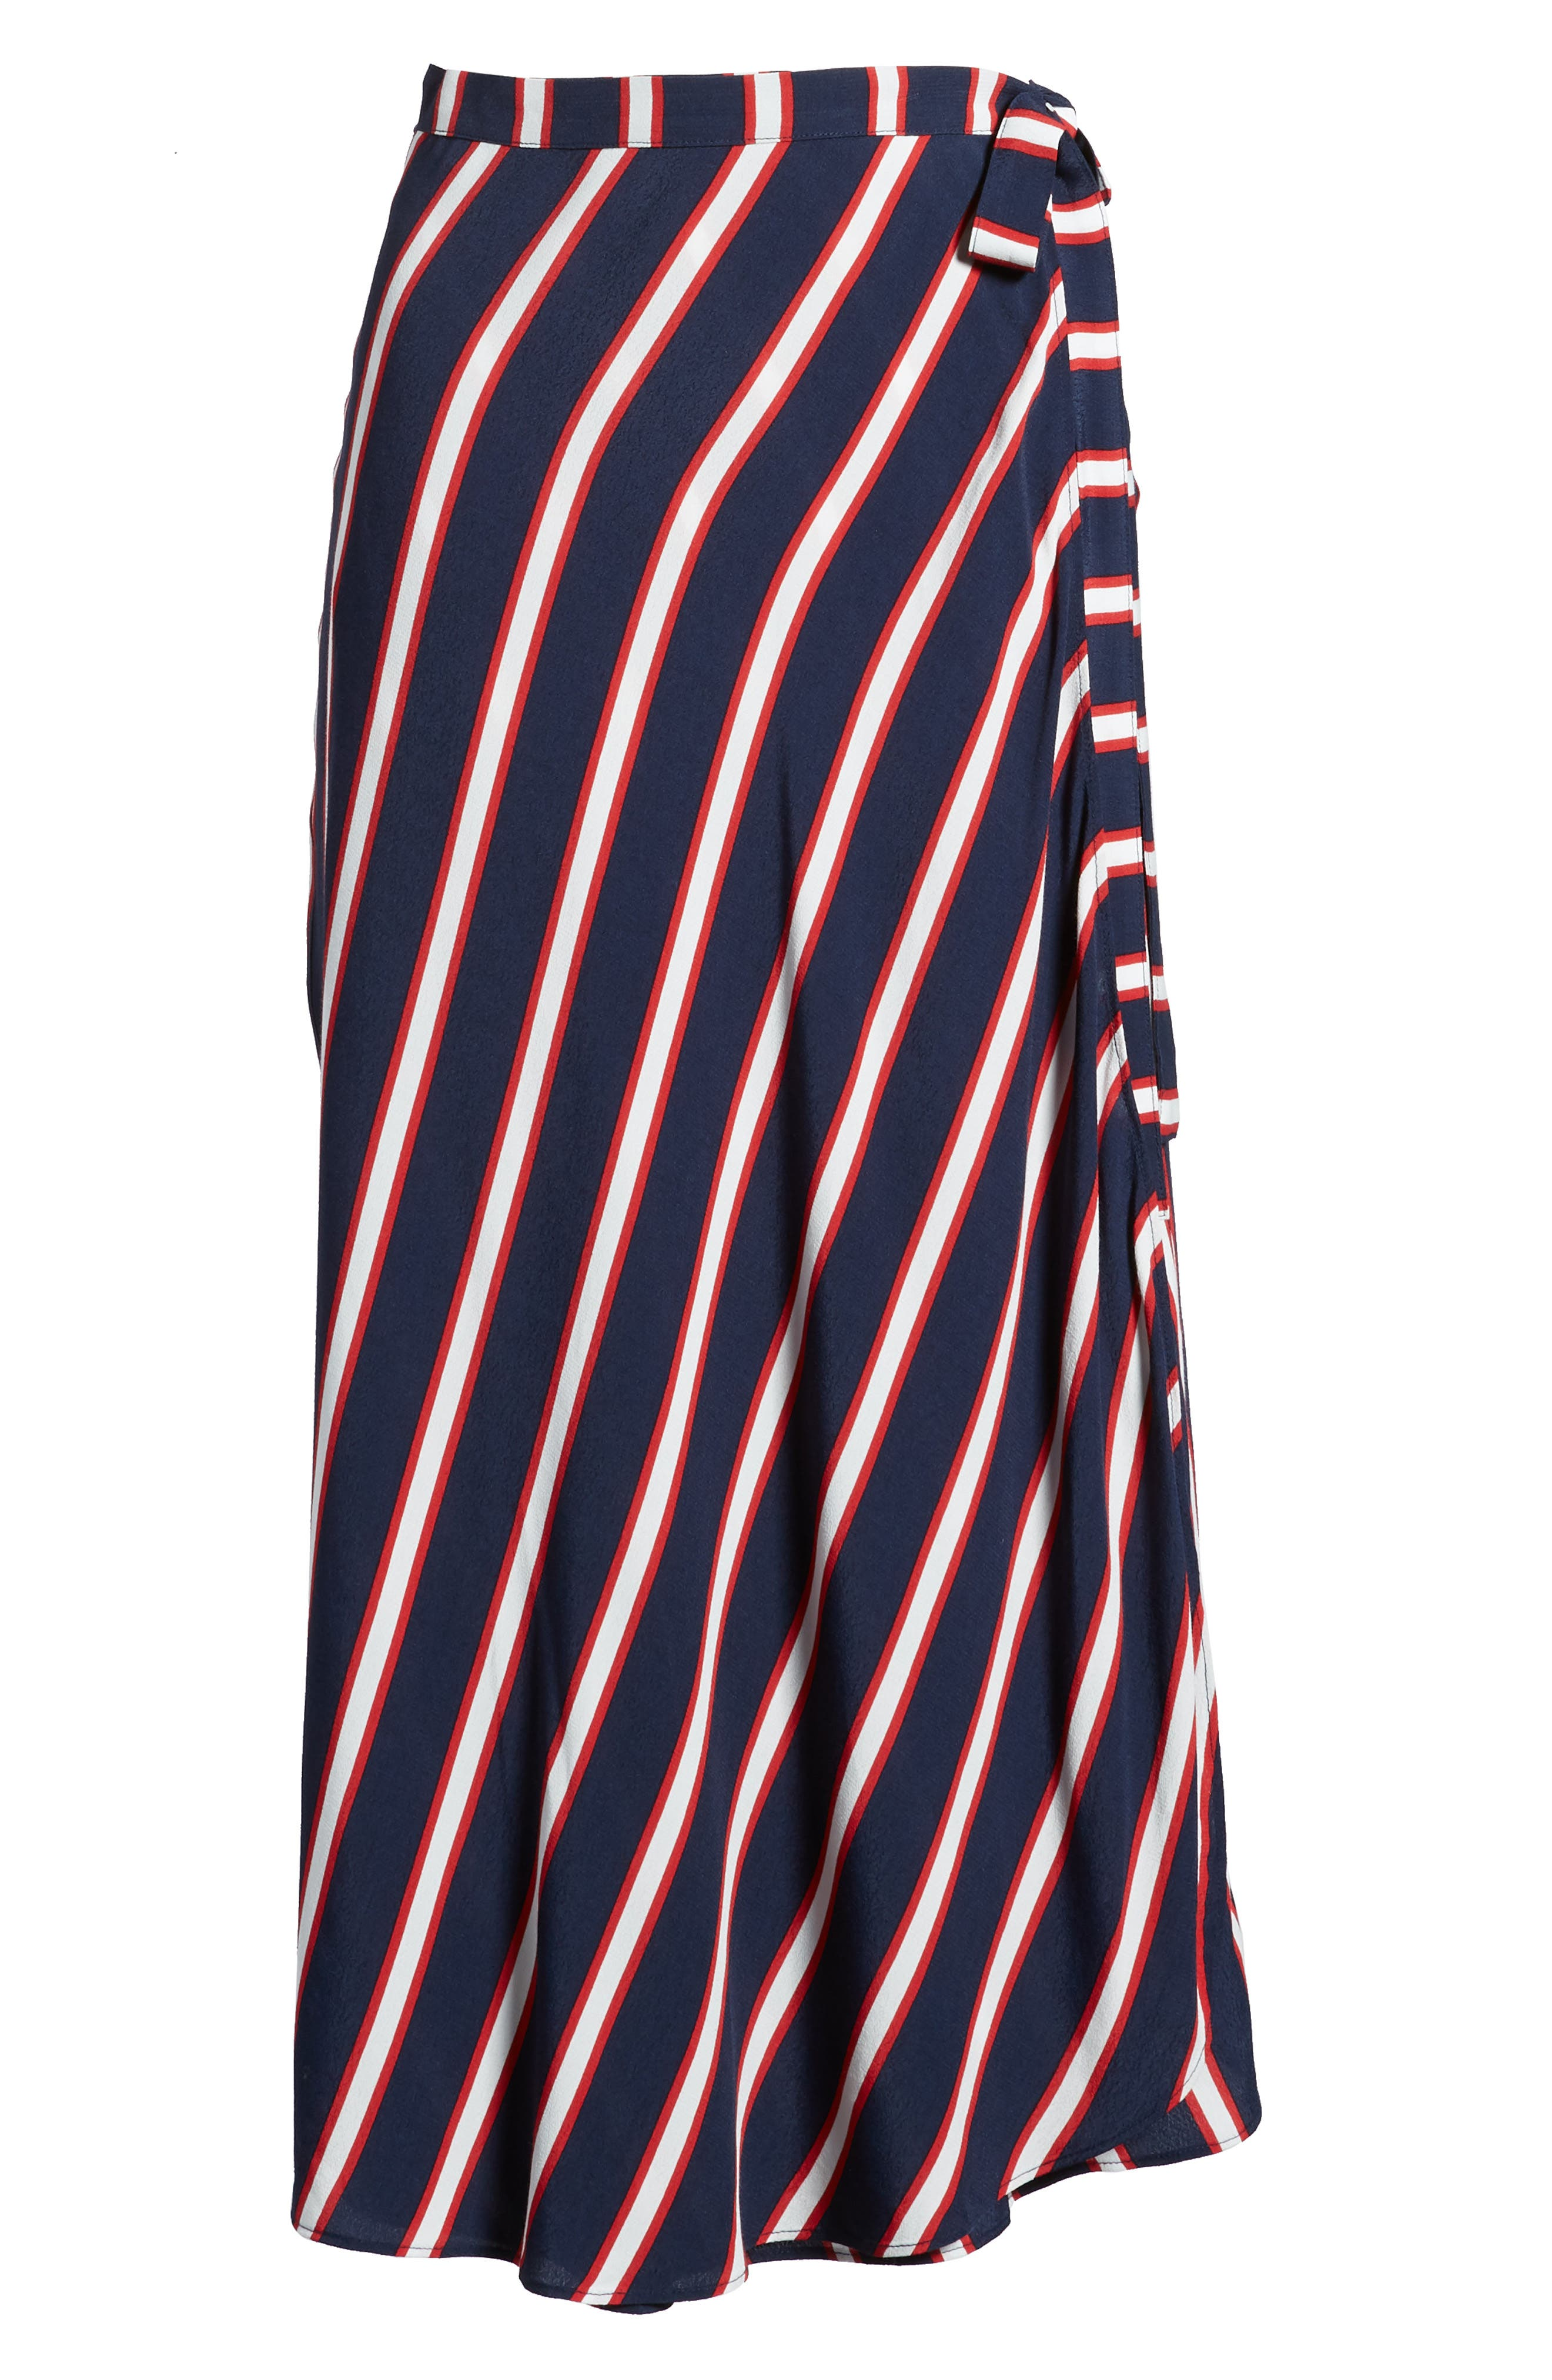 Stripe Midi Wrap Skirt,                             Alternate thumbnail 6, color,                             Navy Peacoat Awning Stripe